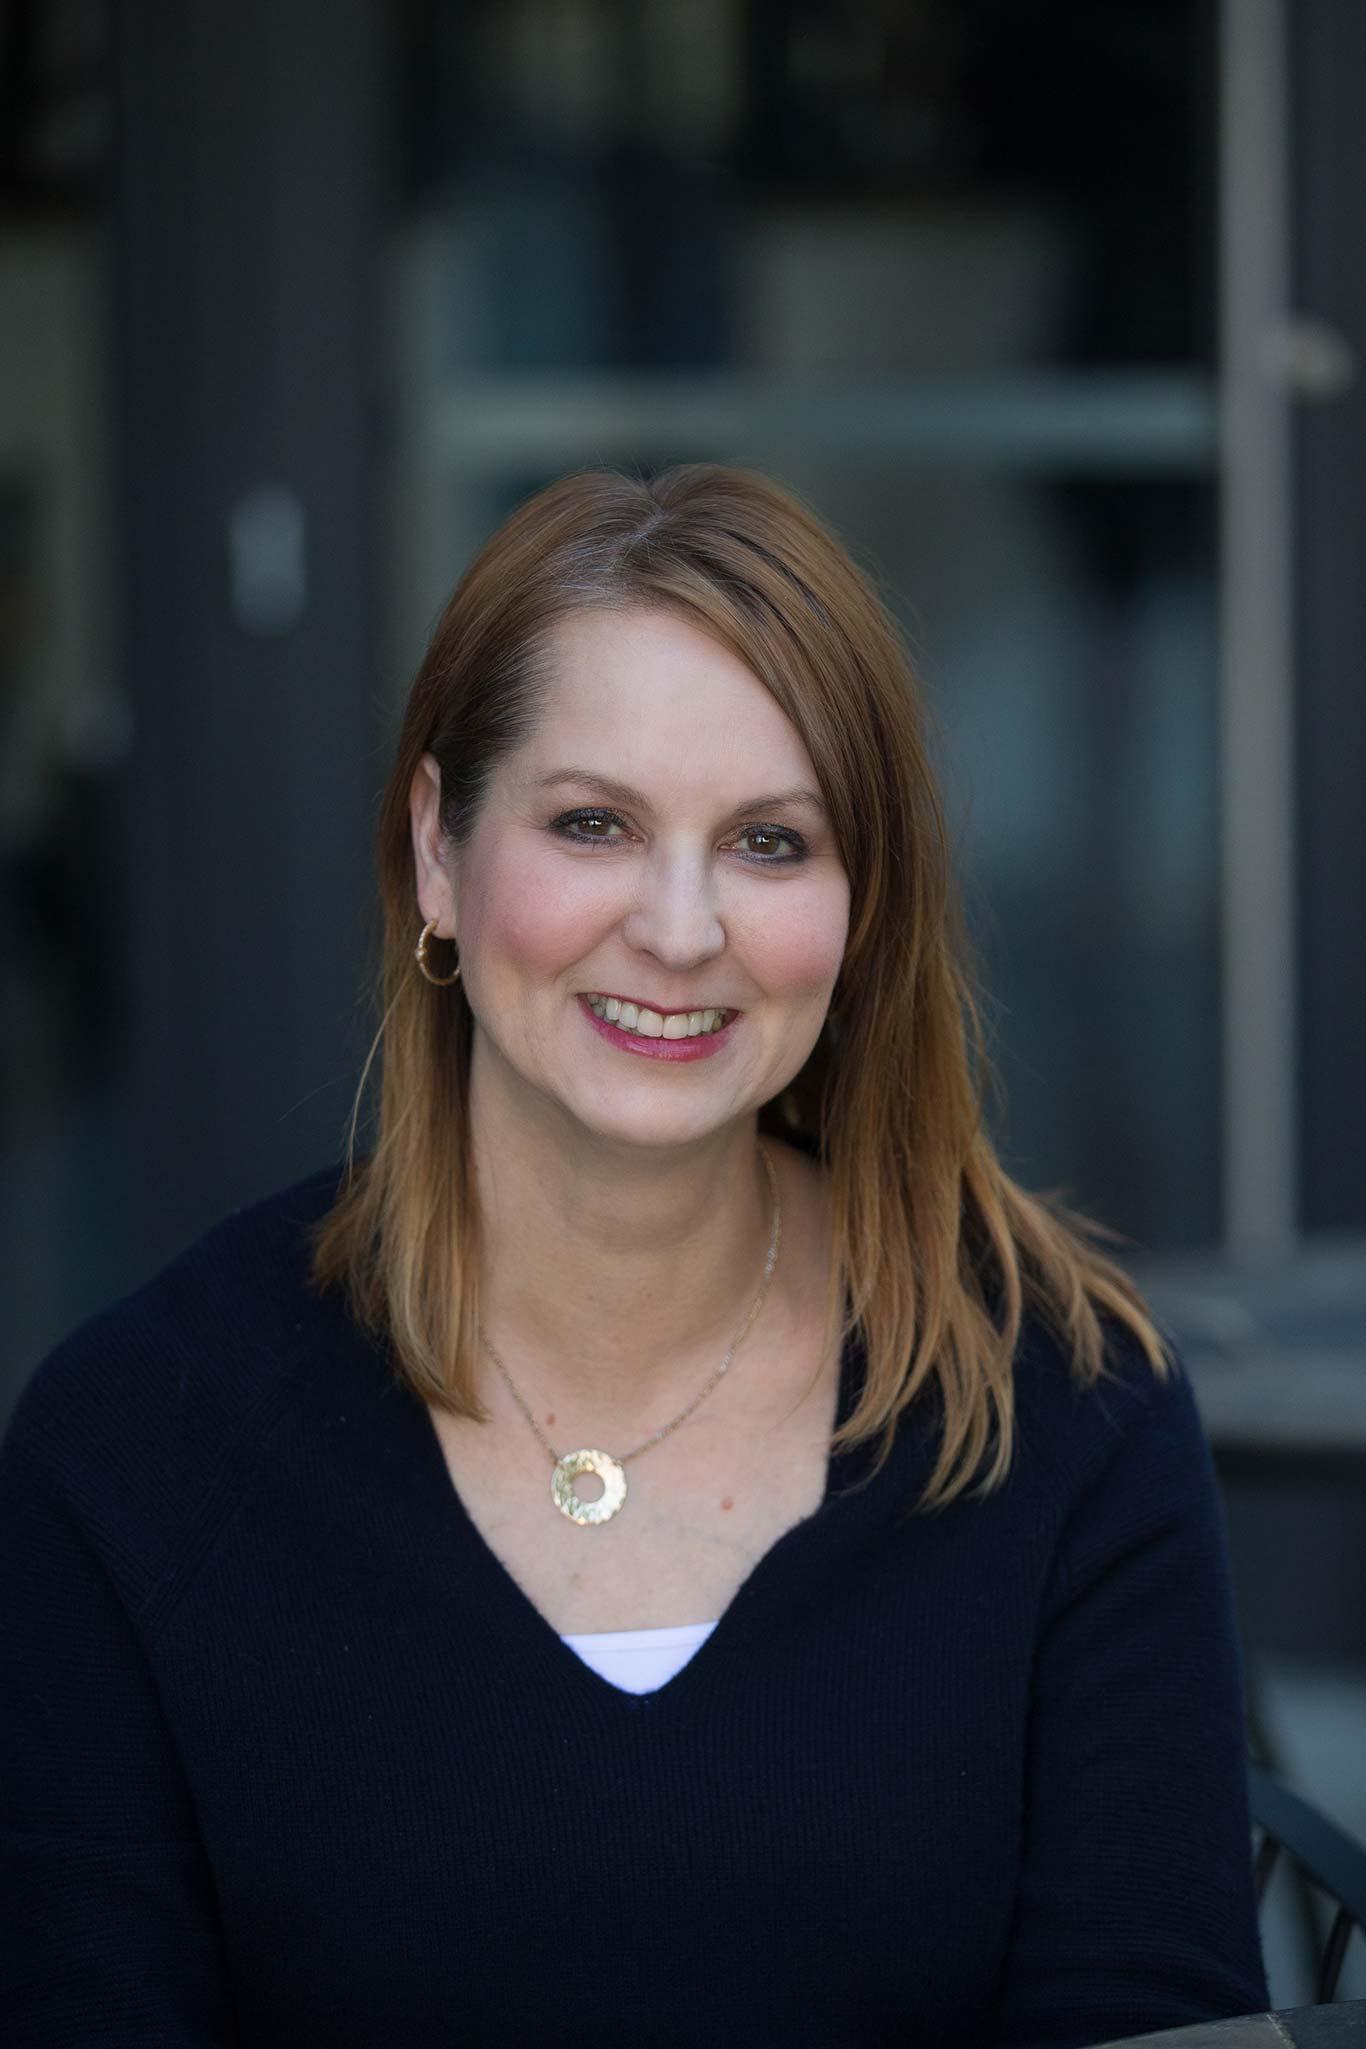 Lisa Lindberg, Vice President of Product Management